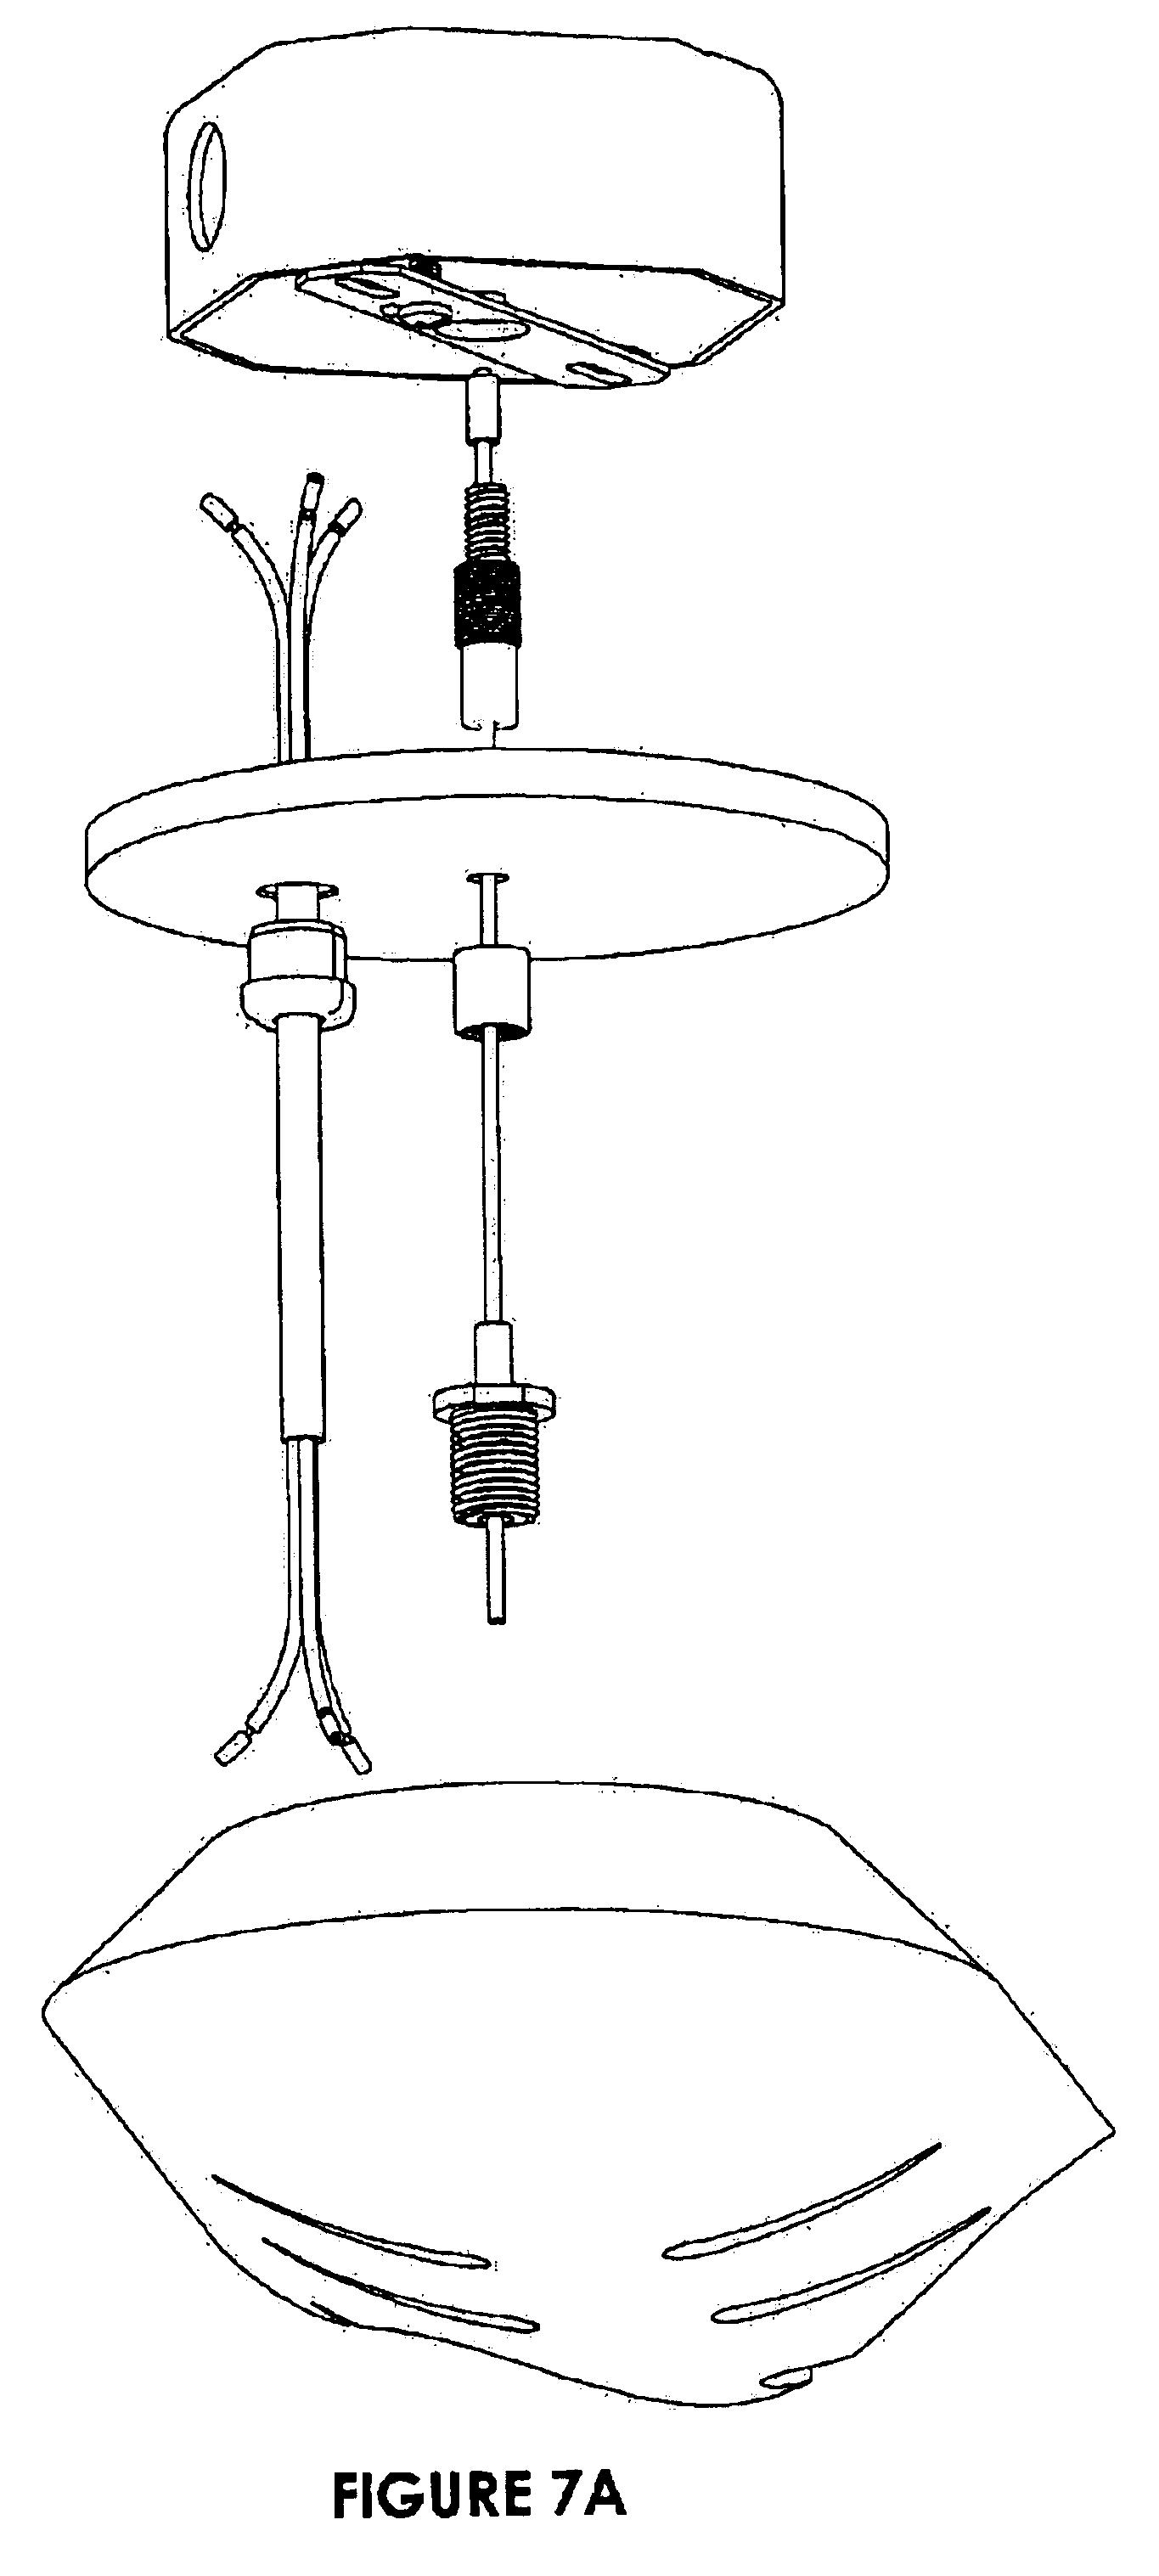 Old emg wiring diagrams old image wiring diagram quick emg 81 wiring diagram single 4l80e wiring